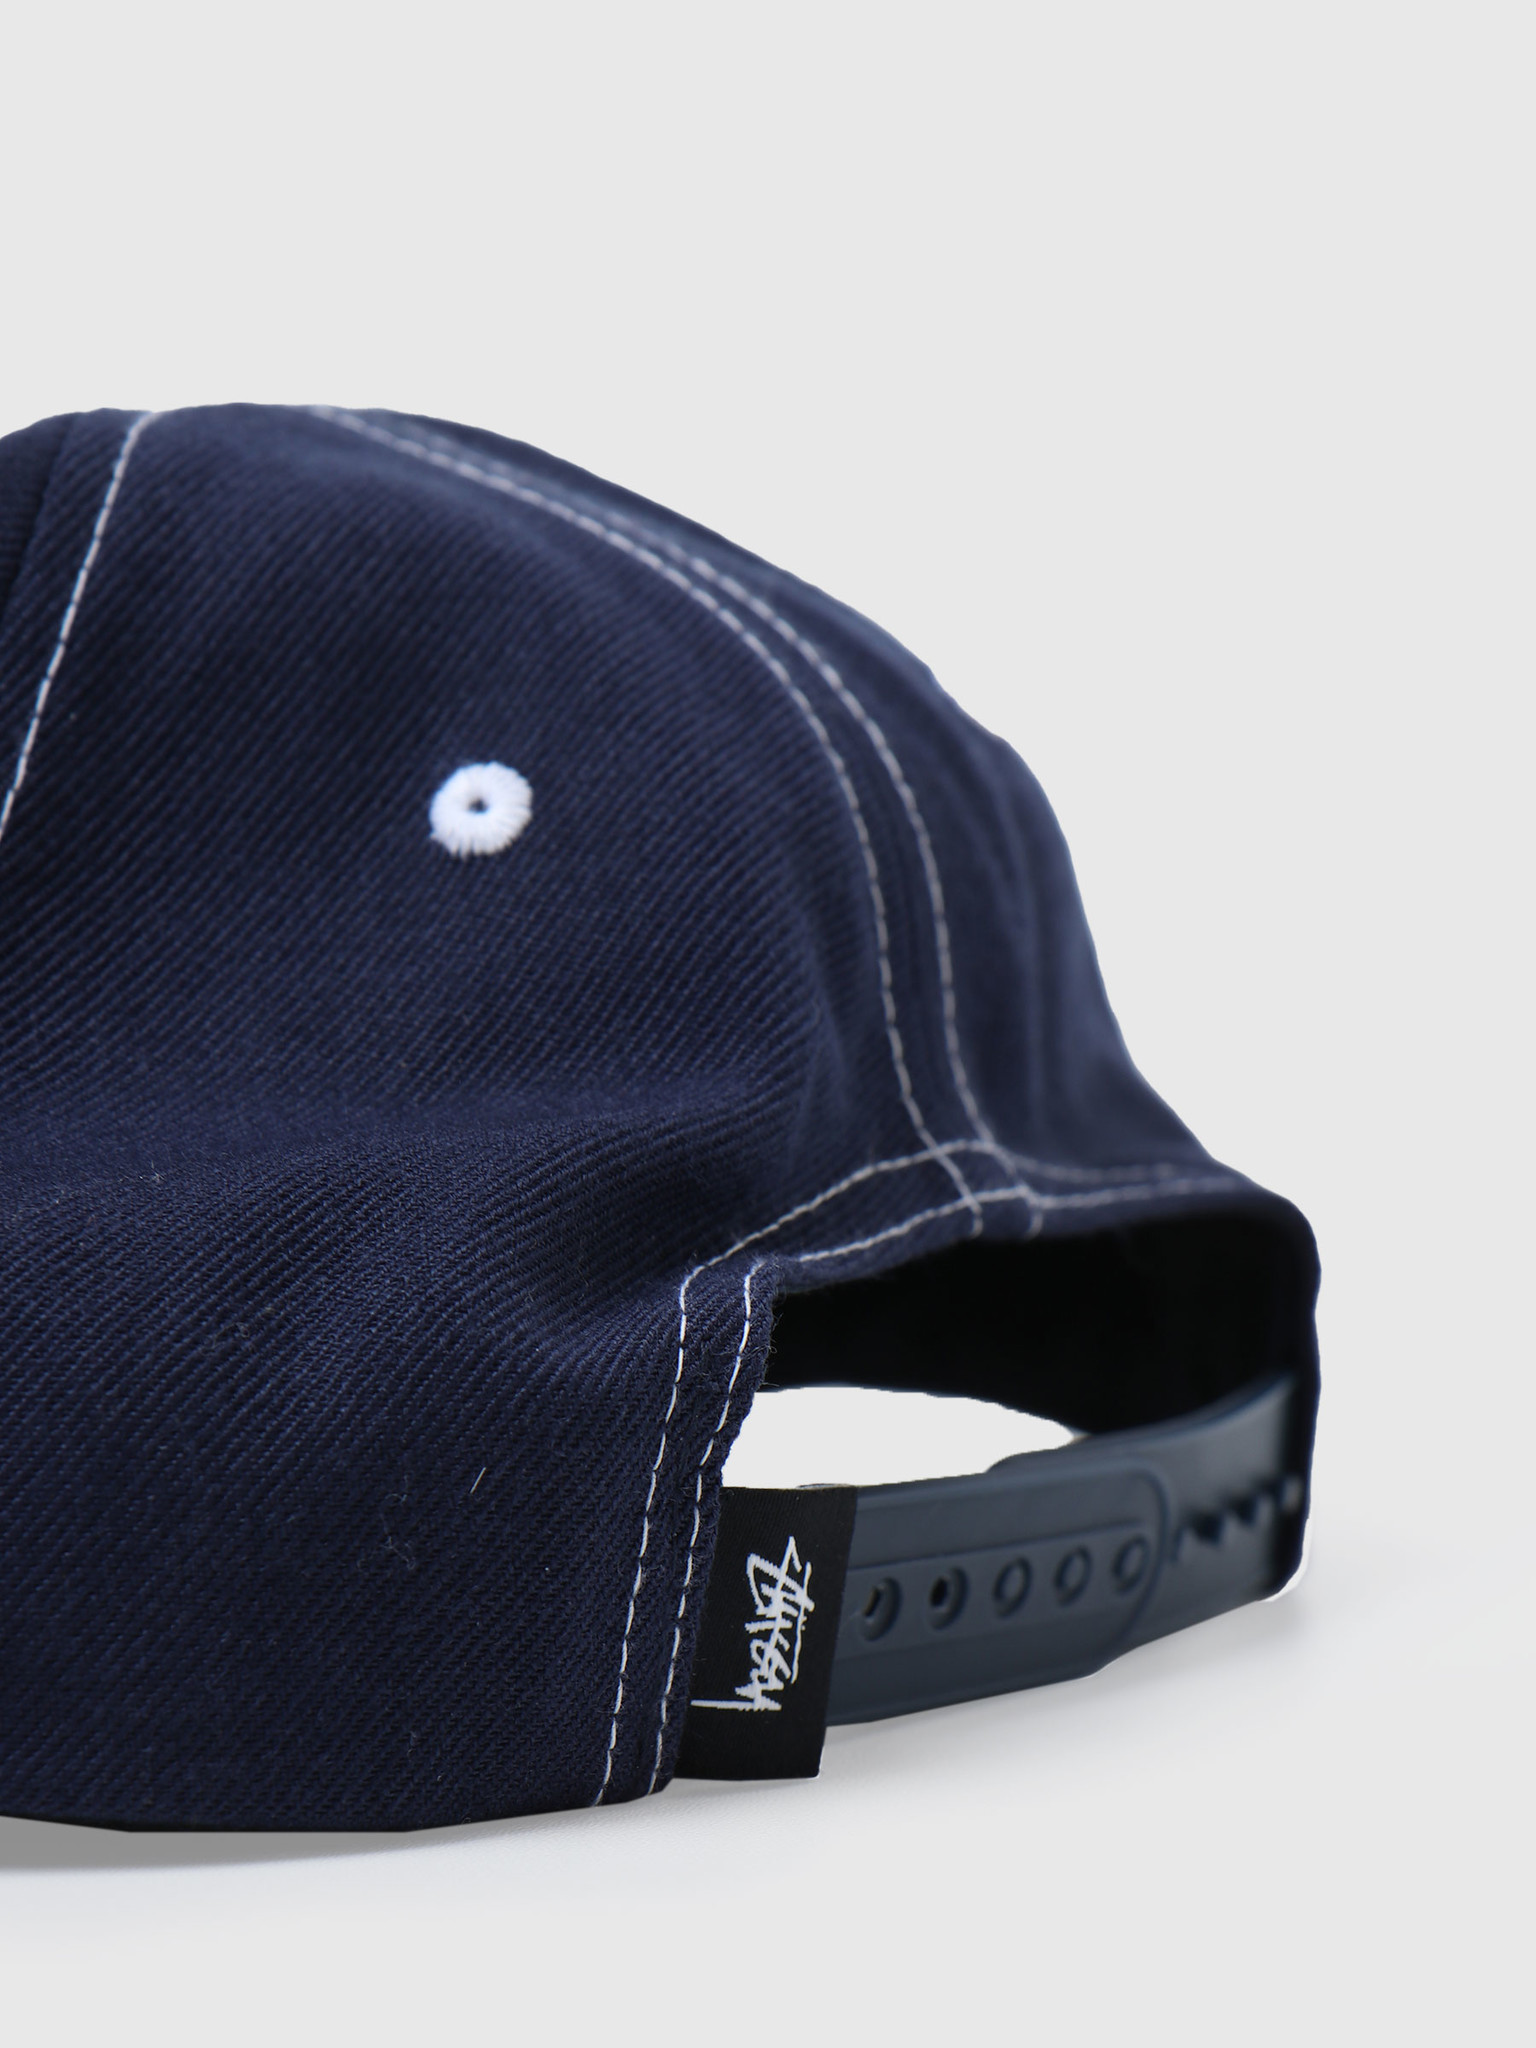 Stussy Stussy Contrast Stitch Stock Cap Navy 6505008090-0806